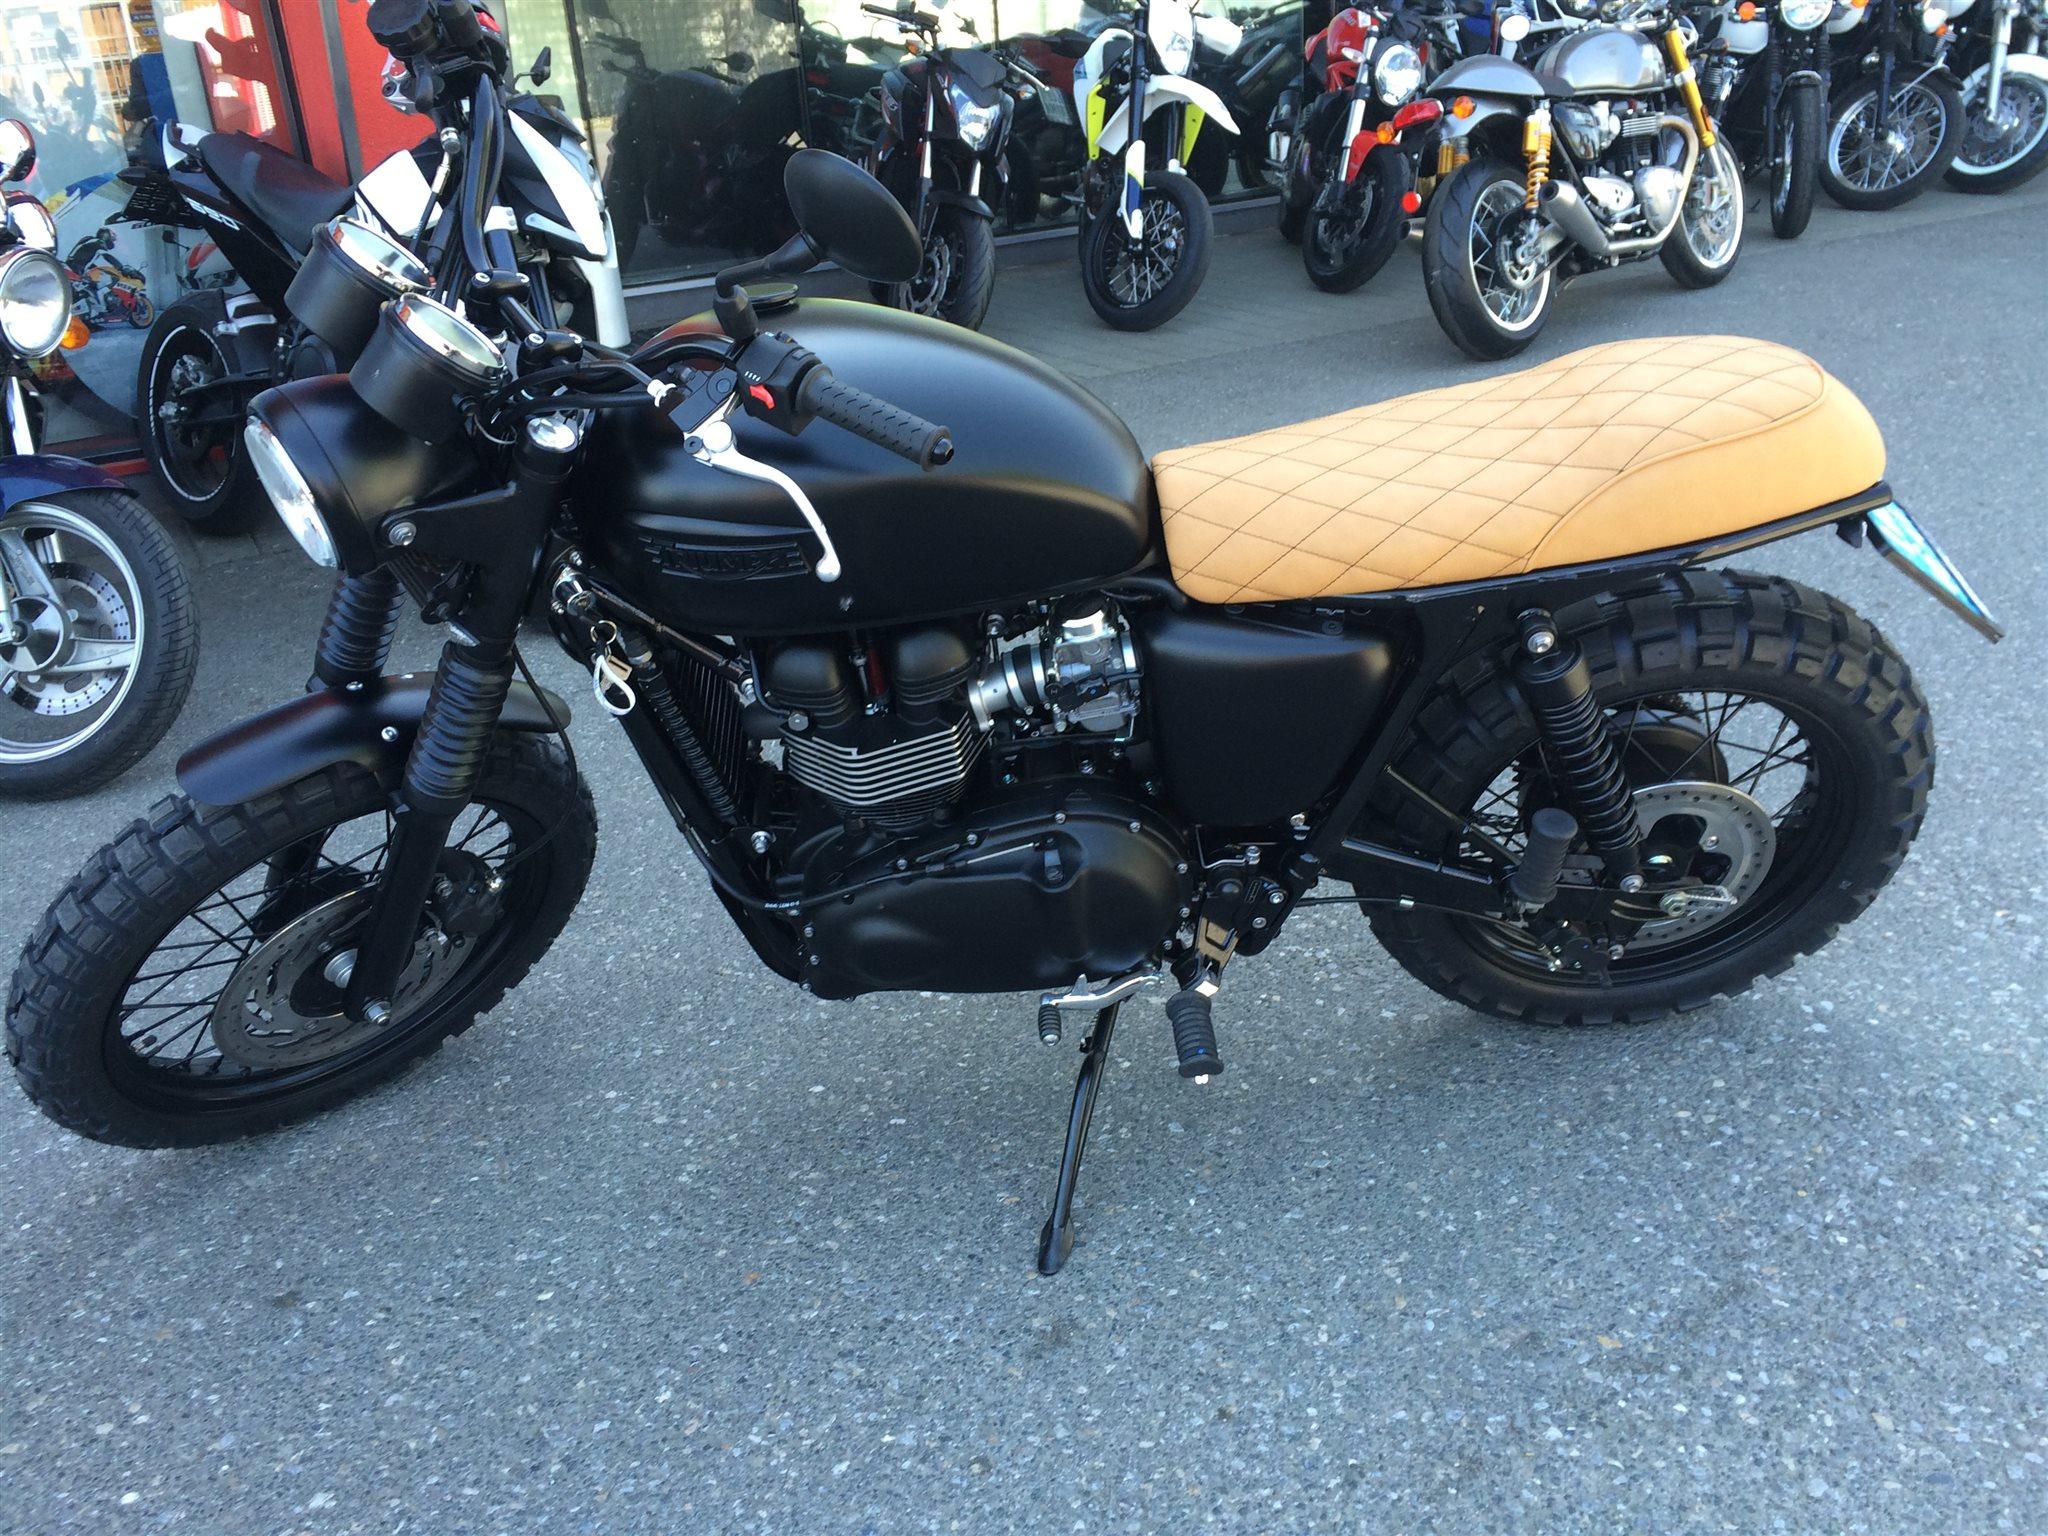 umgebautes motorrad triumph scrambler von motorrad klinik. Black Bedroom Furniture Sets. Home Design Ideas